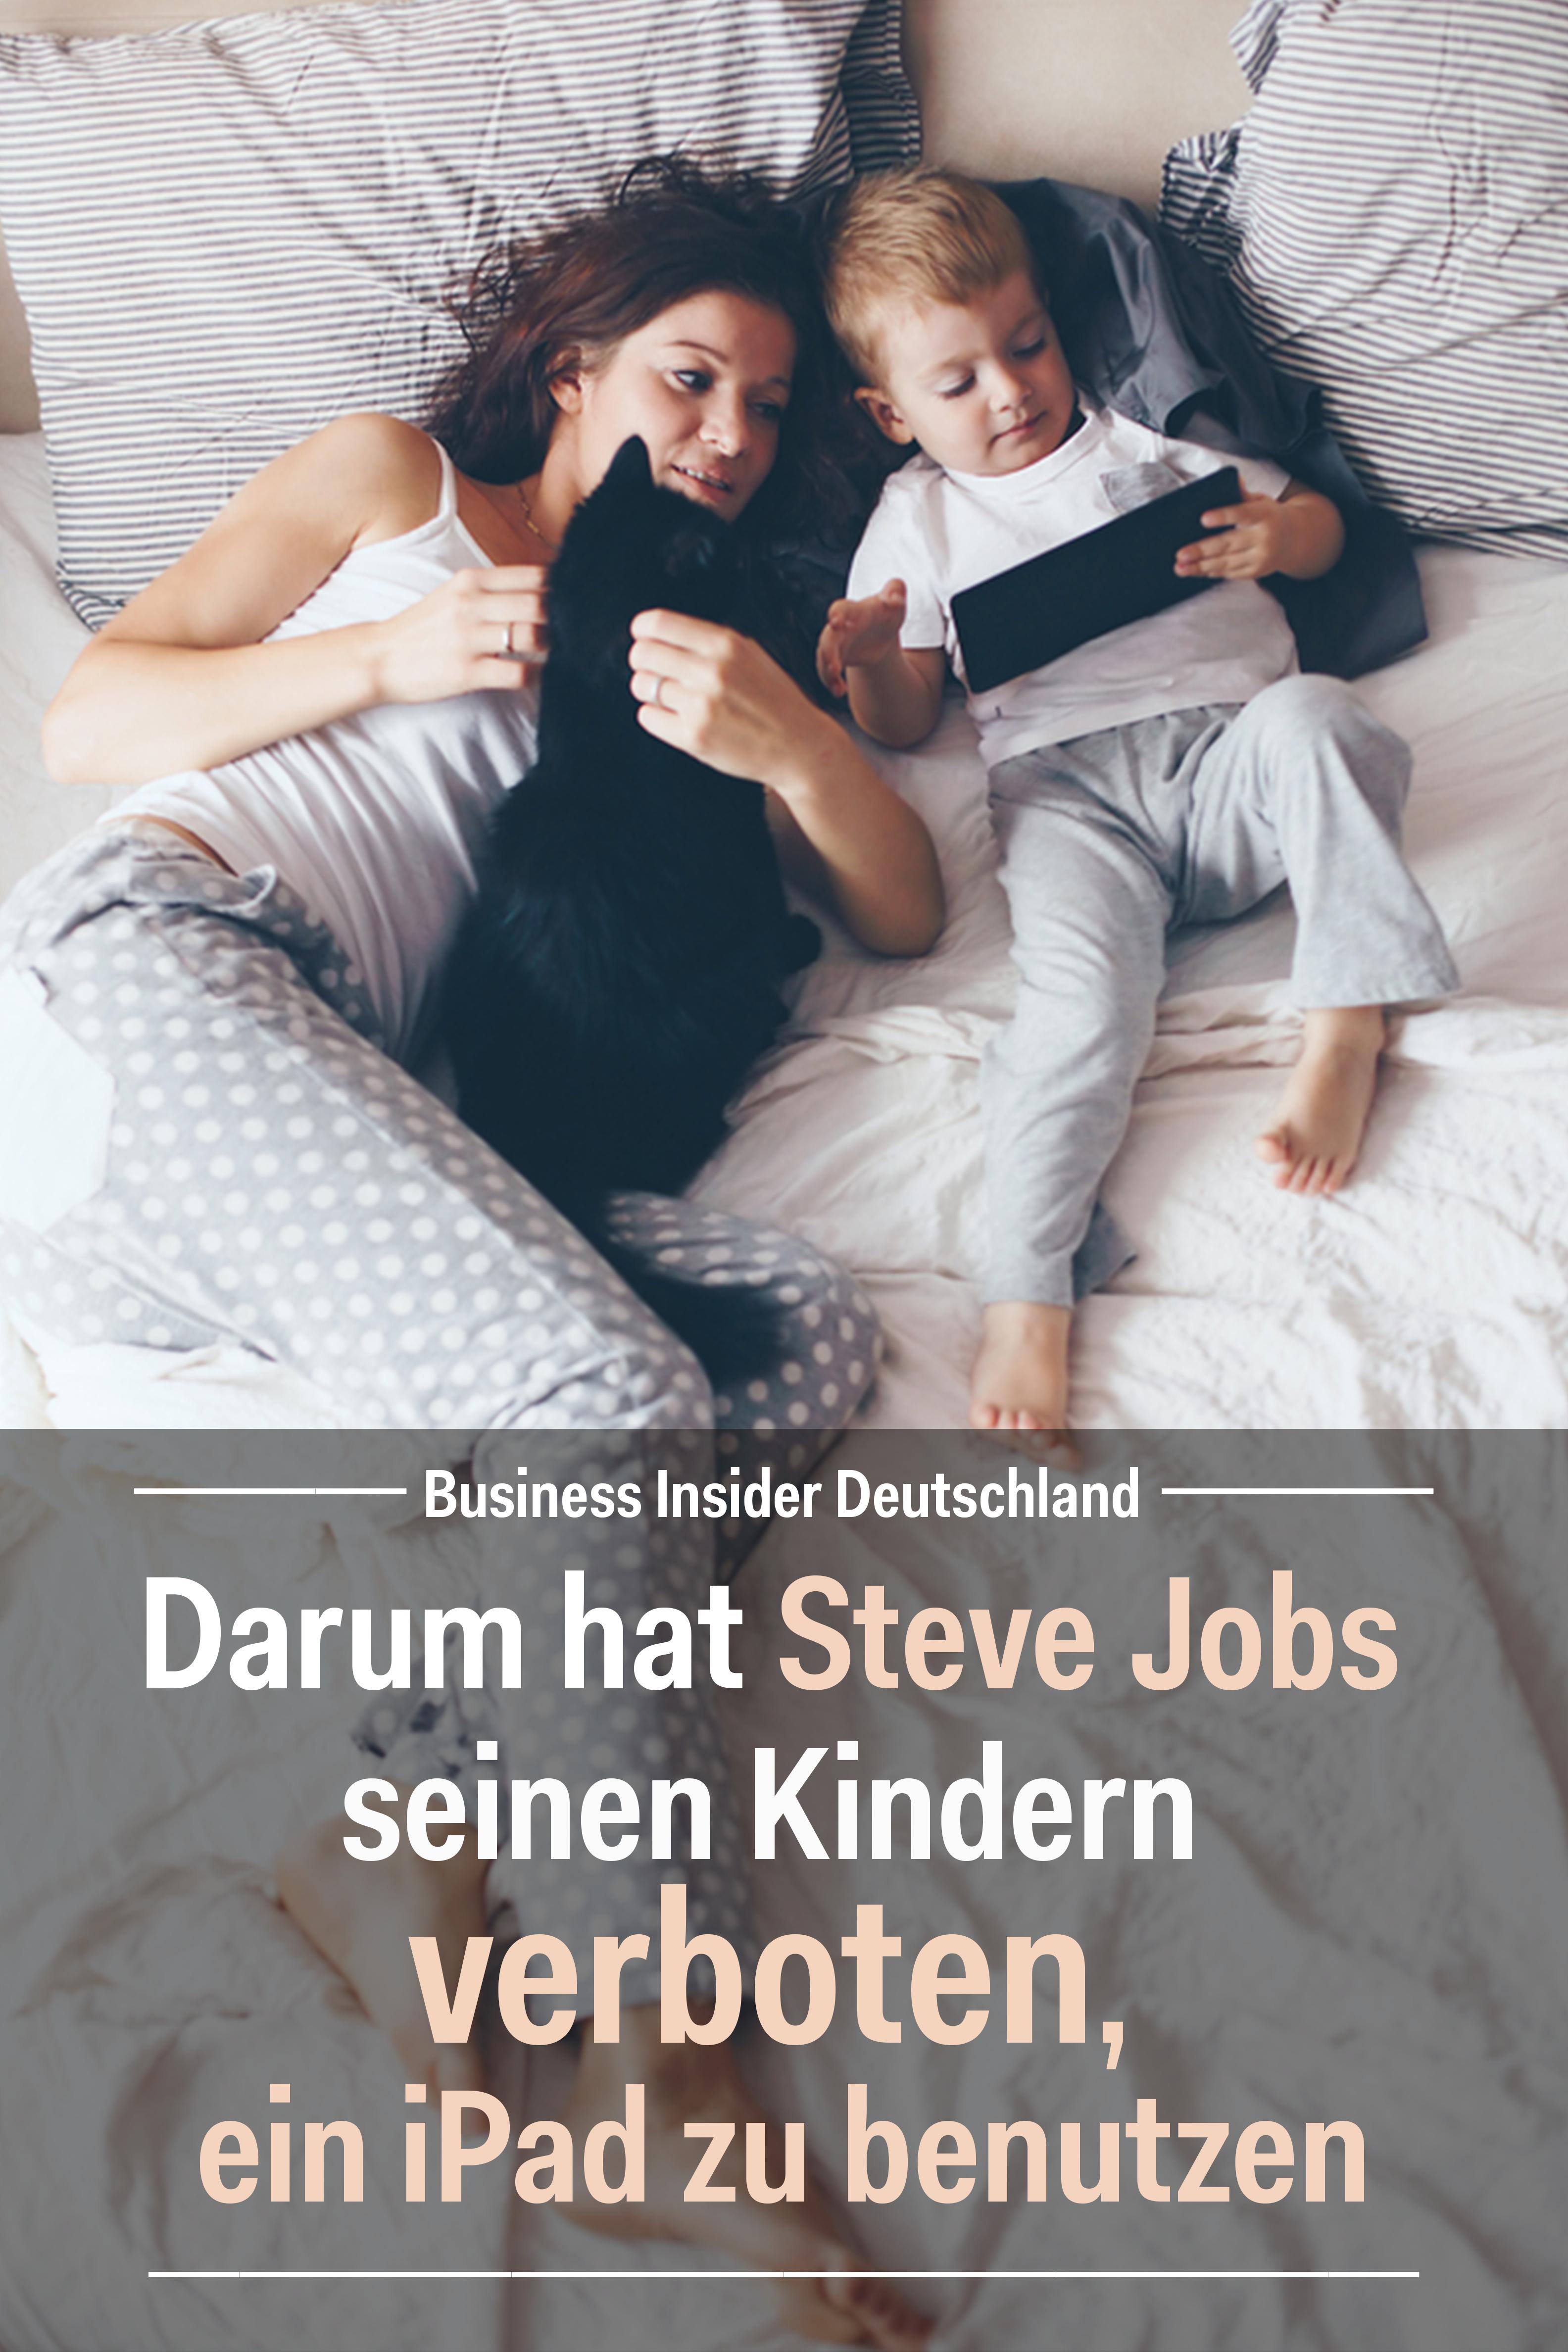 Steve Jobs Kinder